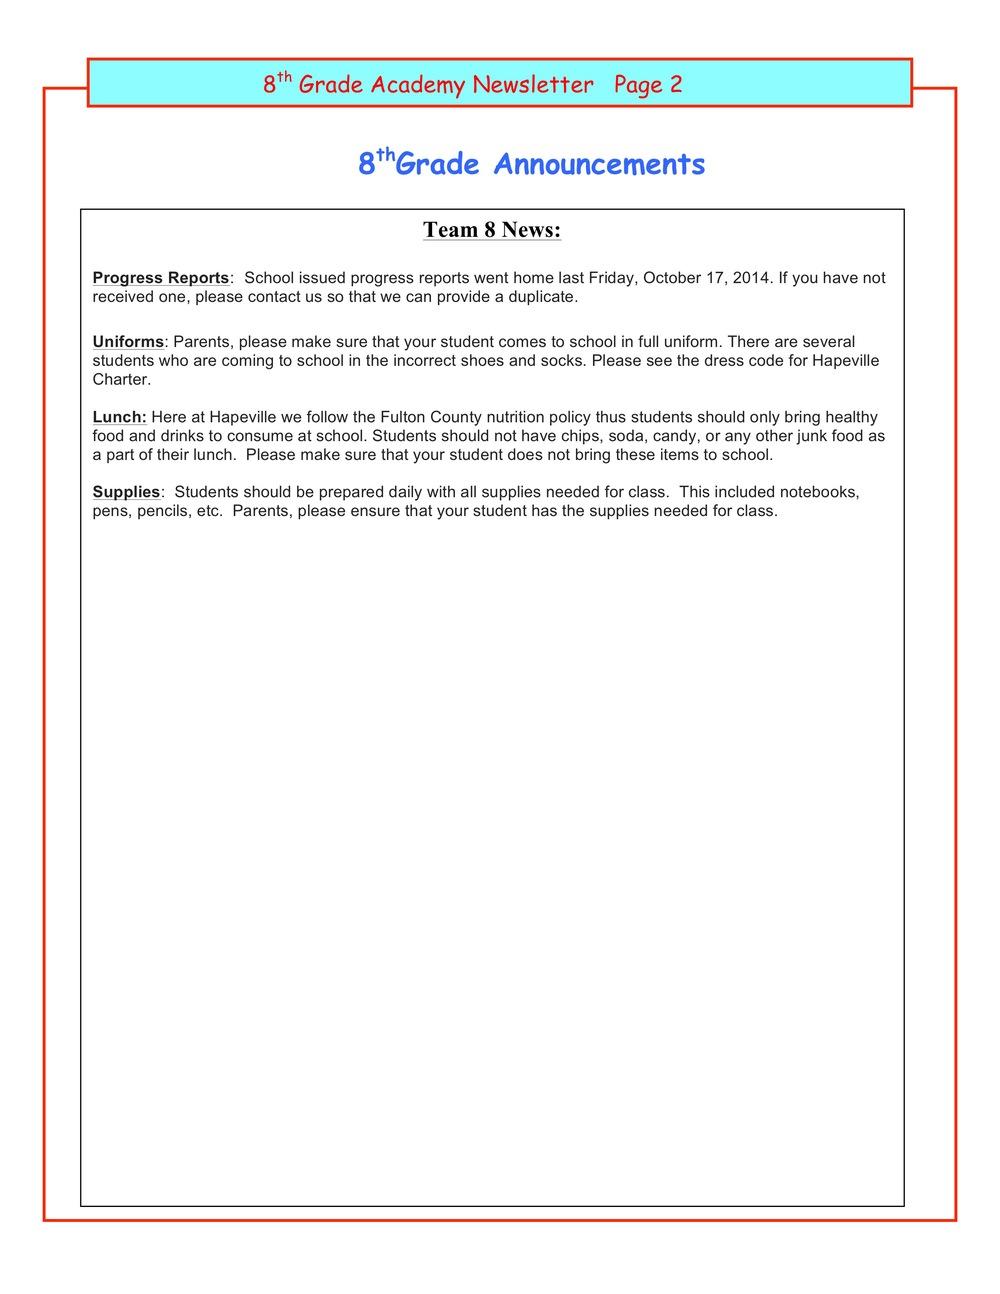 Newsletter Image8th grade october 20 2.jpeg